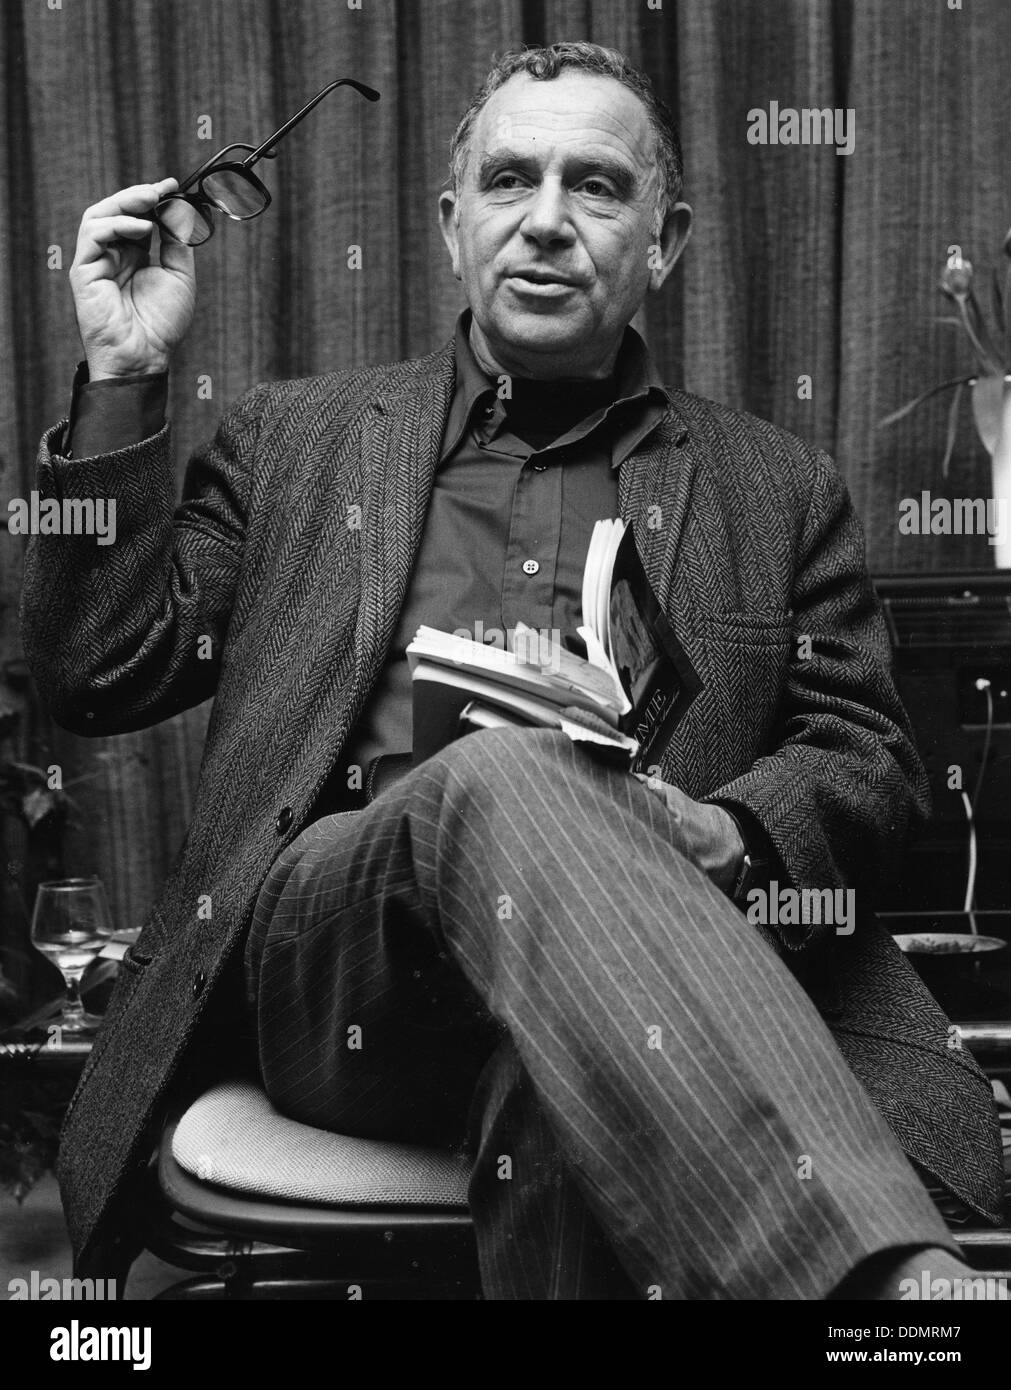 Yehuda Amichai (1924-2000), Hebrew Poet. - Stock Image